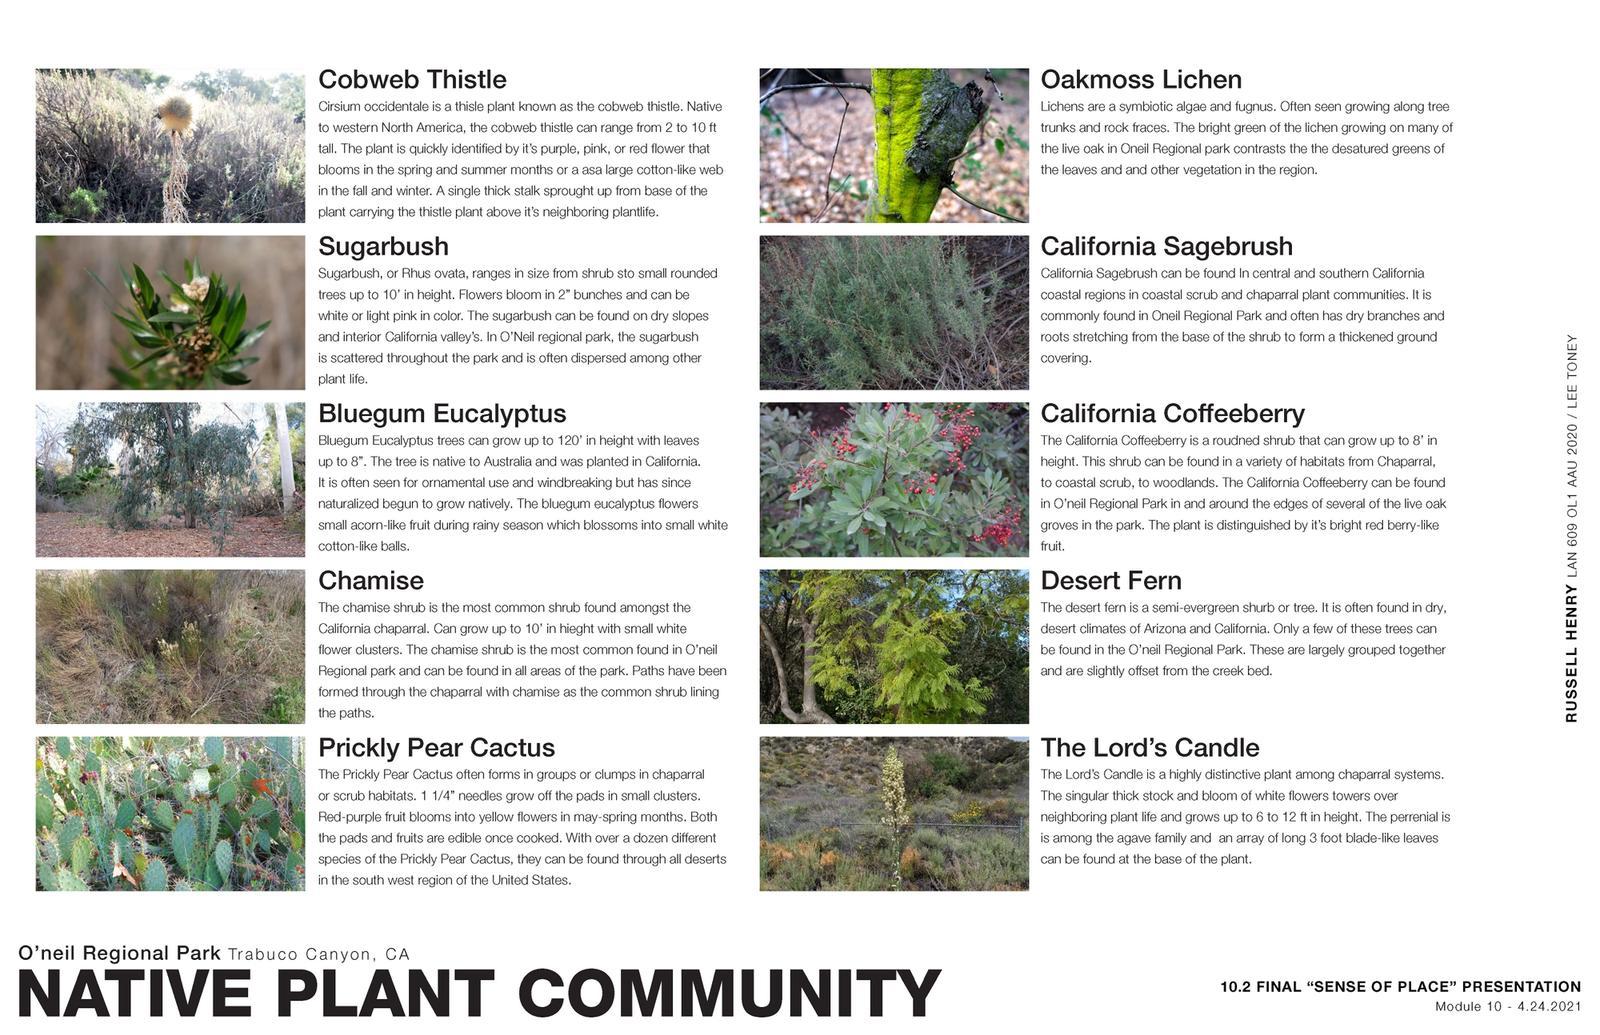 Sense of Place - Native Plant Community